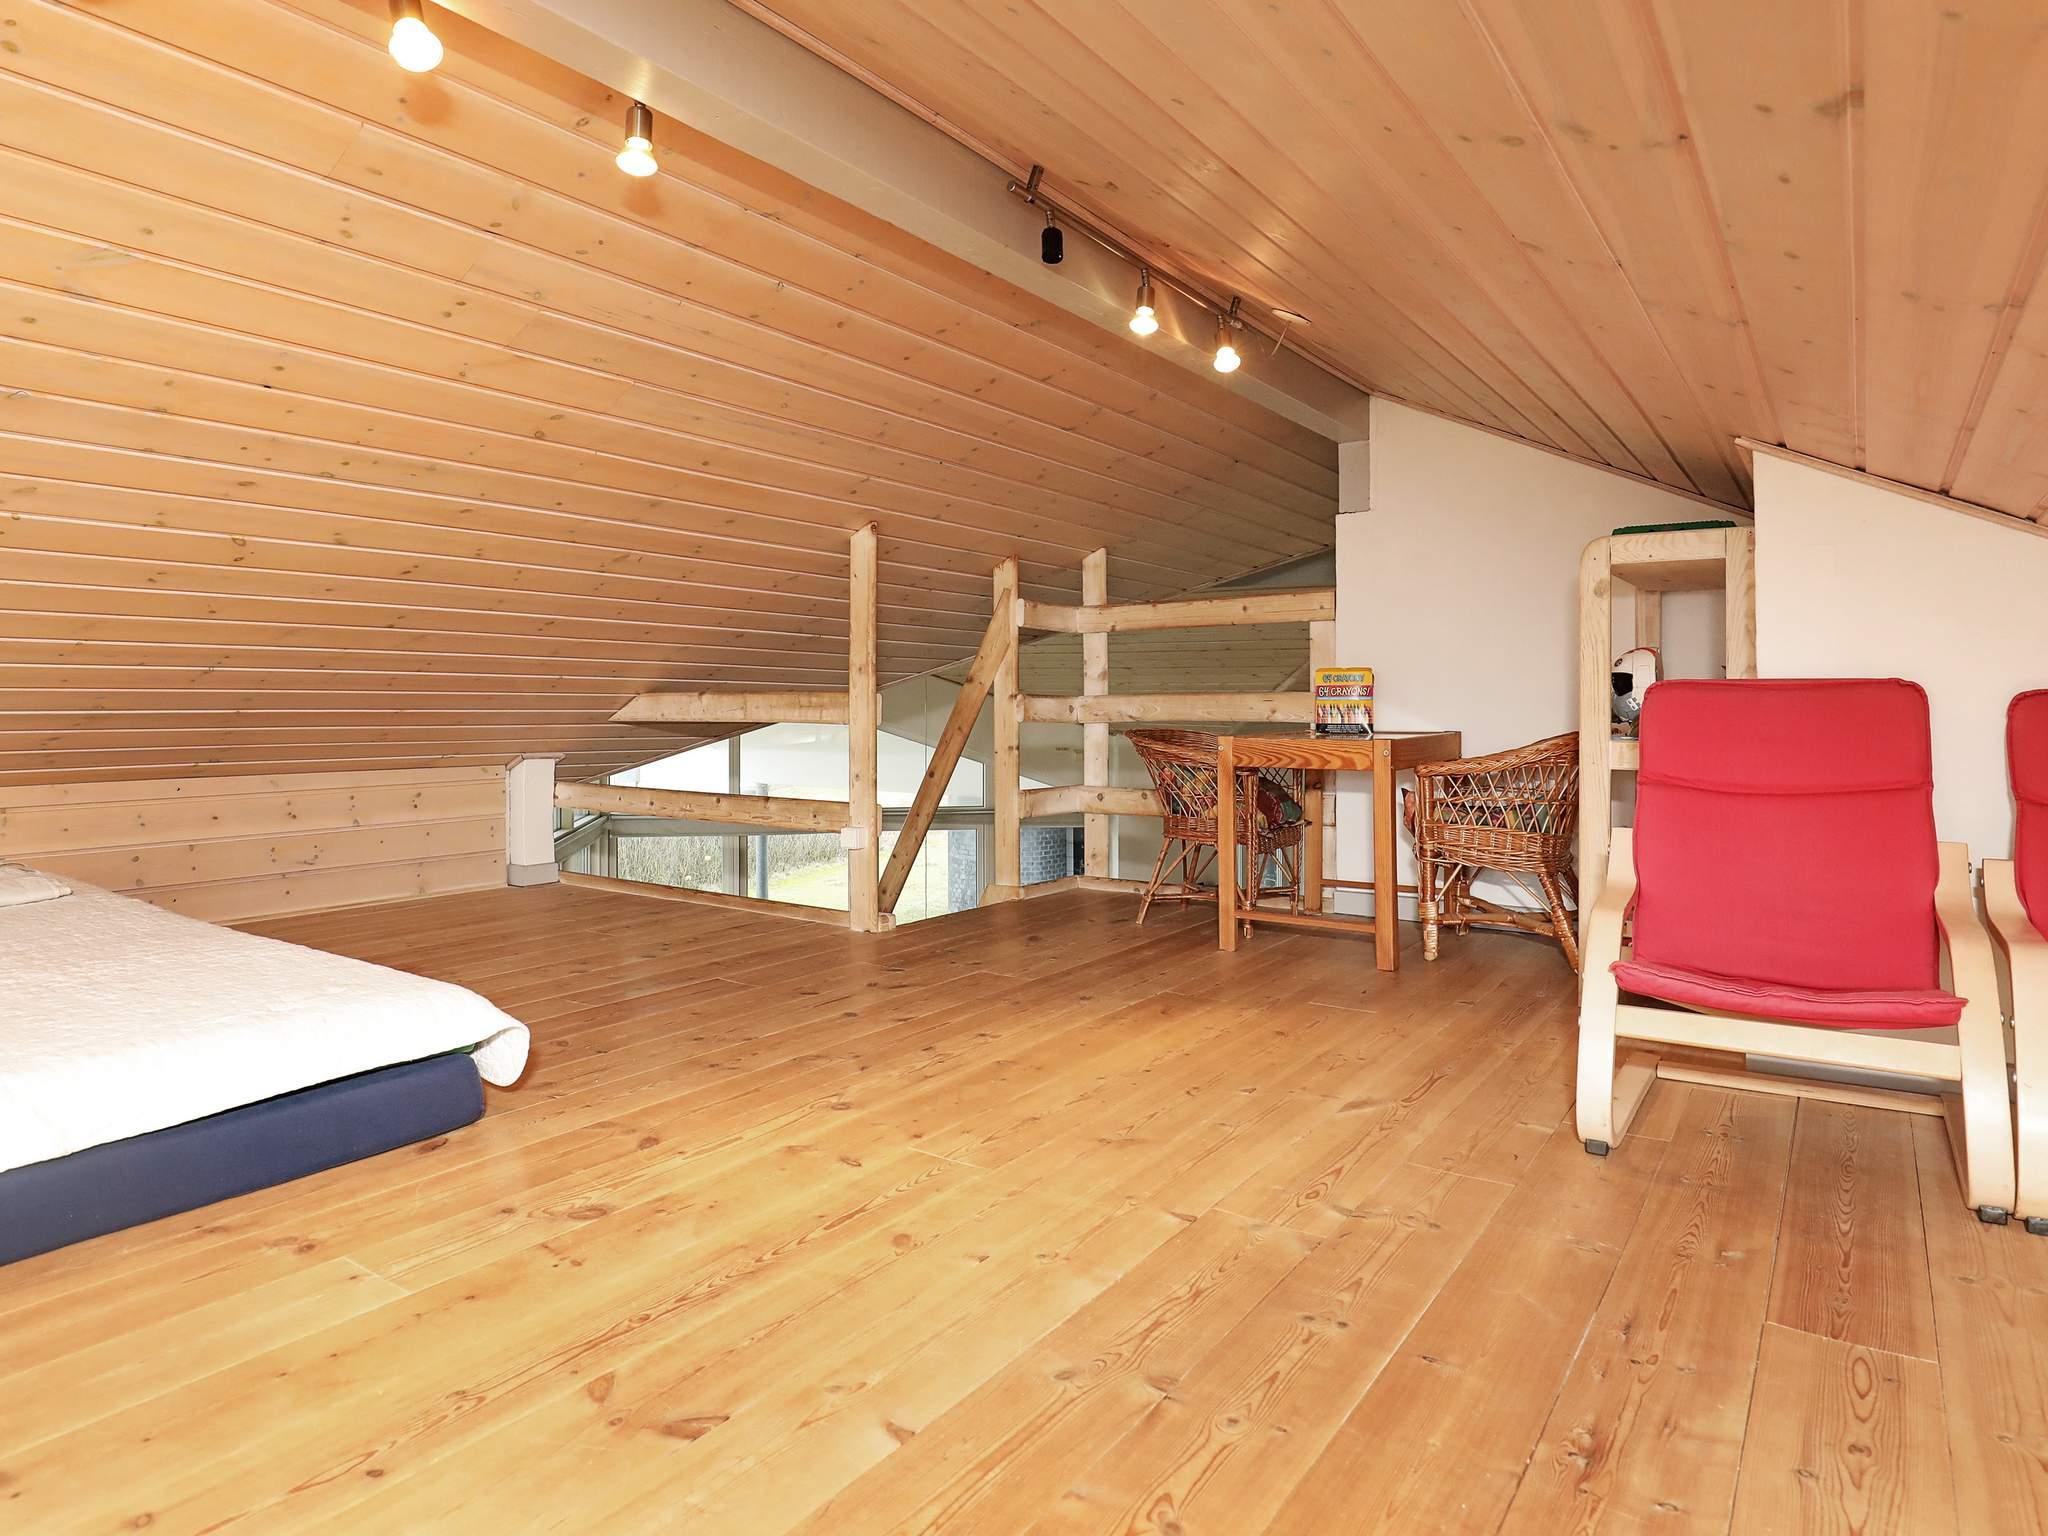 Ferienhaus Haurvig (125276), Hvide Sande, , Westjütland, Dänemark, Bild 7